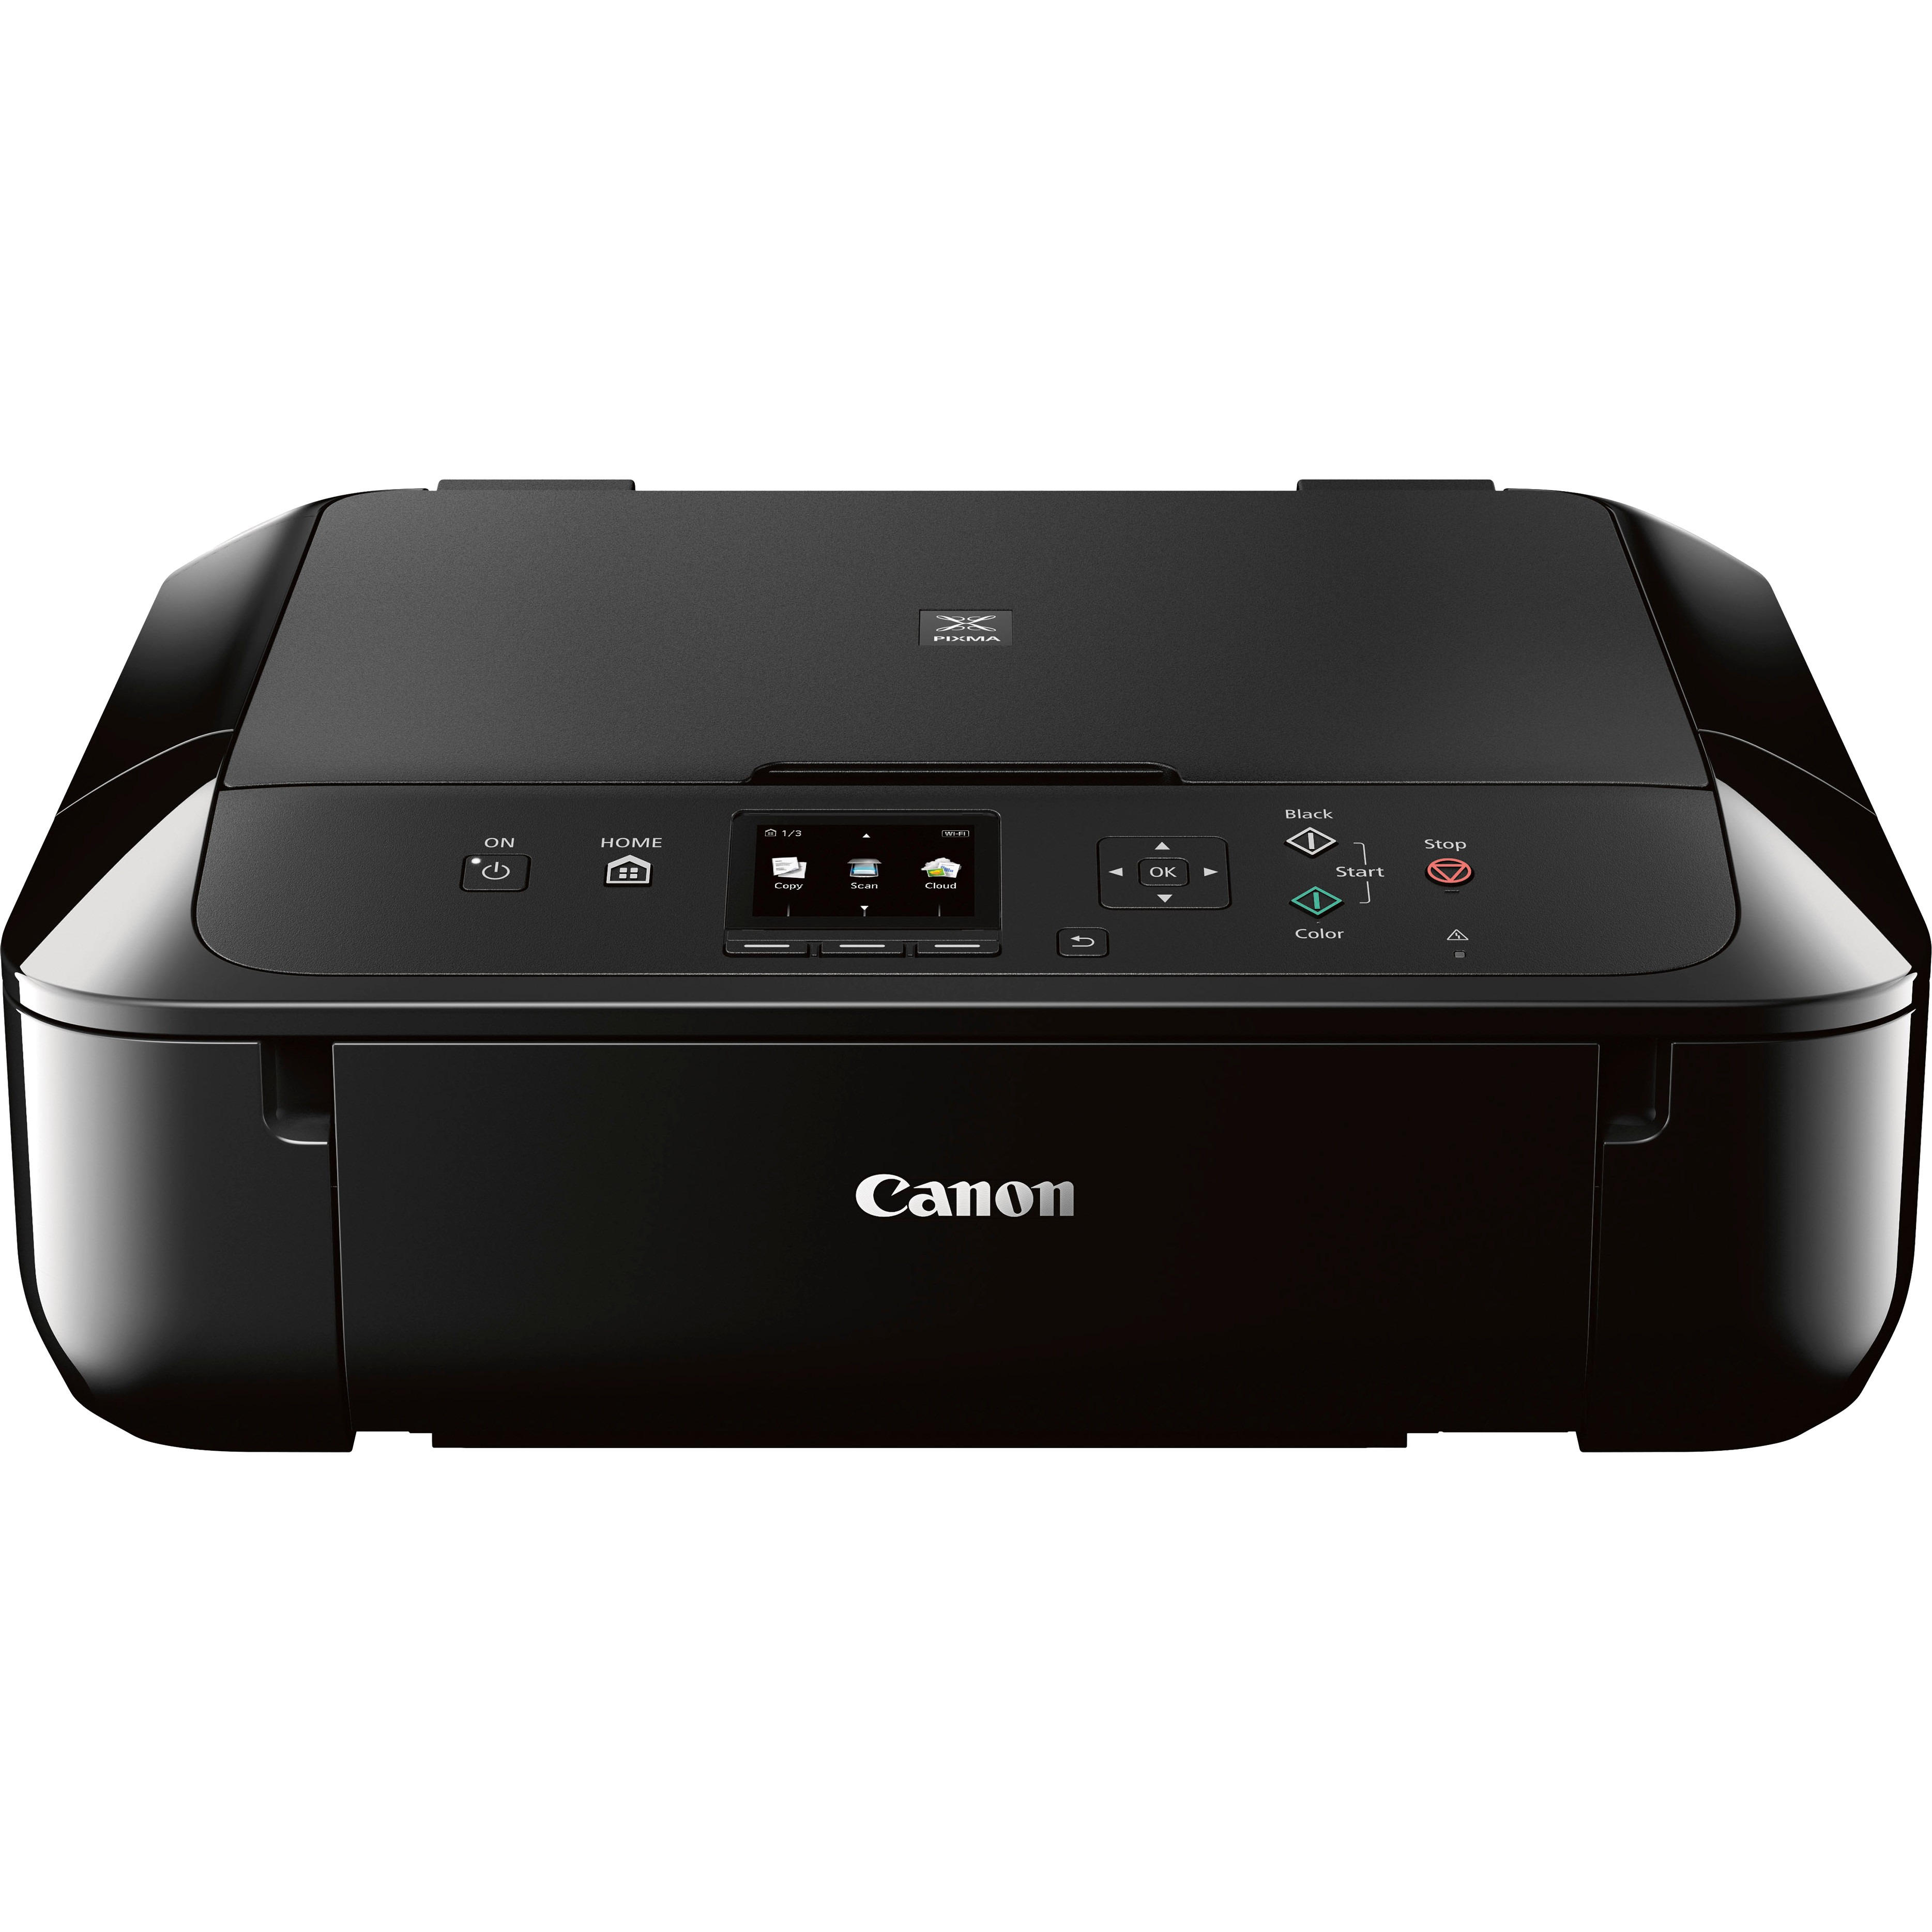 Canon PIXMA MG5720 Wireless Photo All-In-One Inkjet Printer,  Copy/Print/Scan - Walmart.com